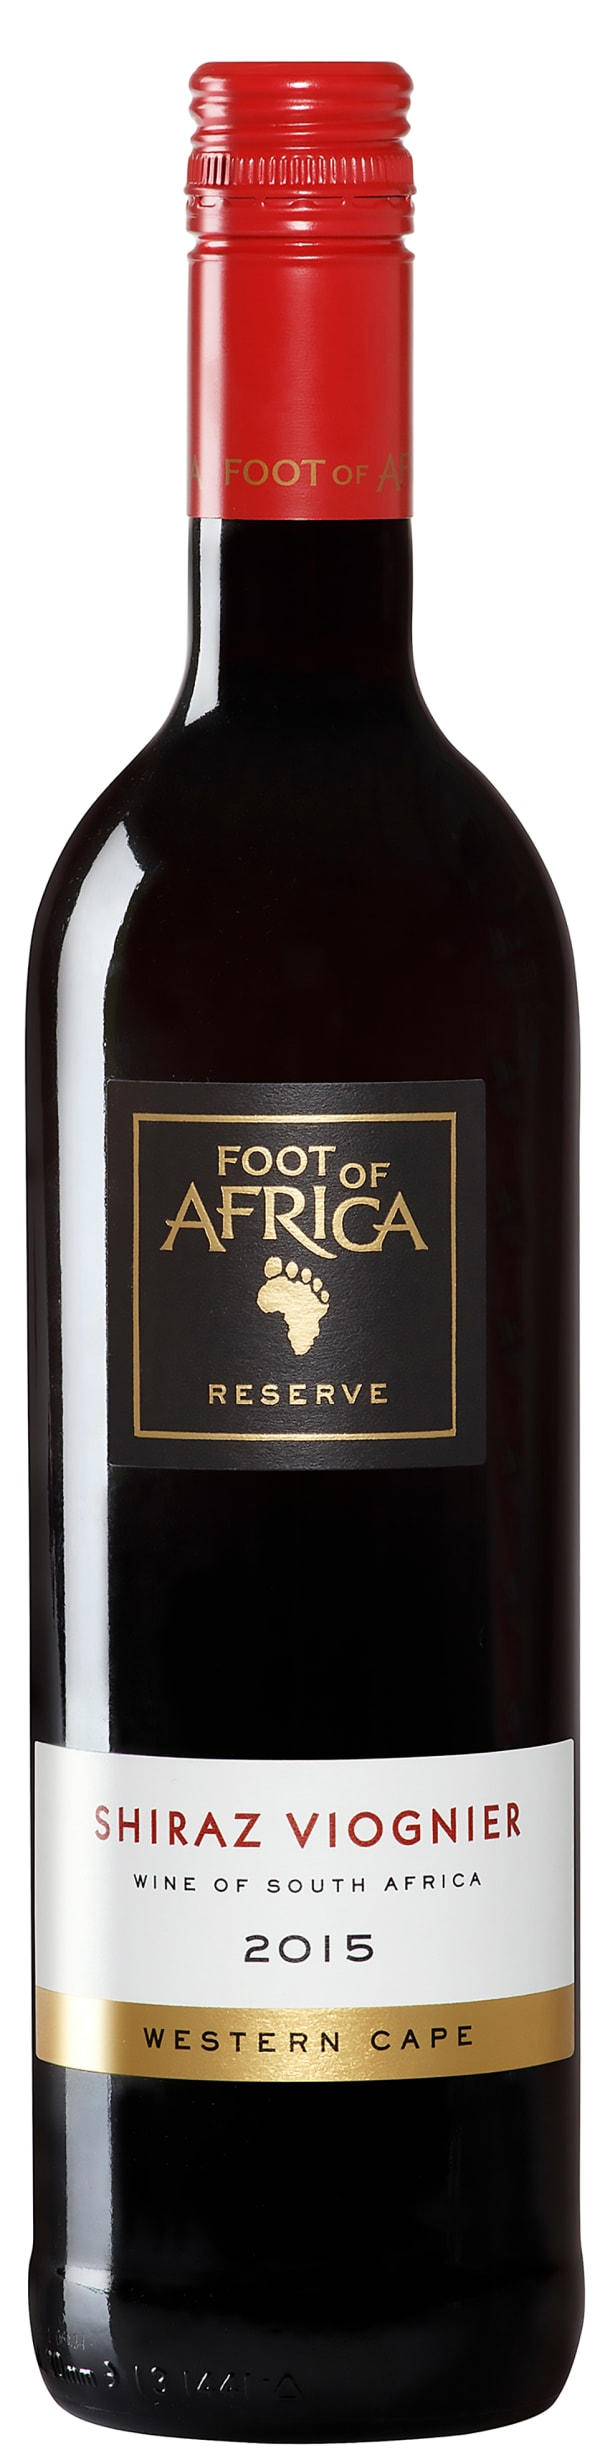 Foot of Africa Reserve Shiraz Viognier 2015